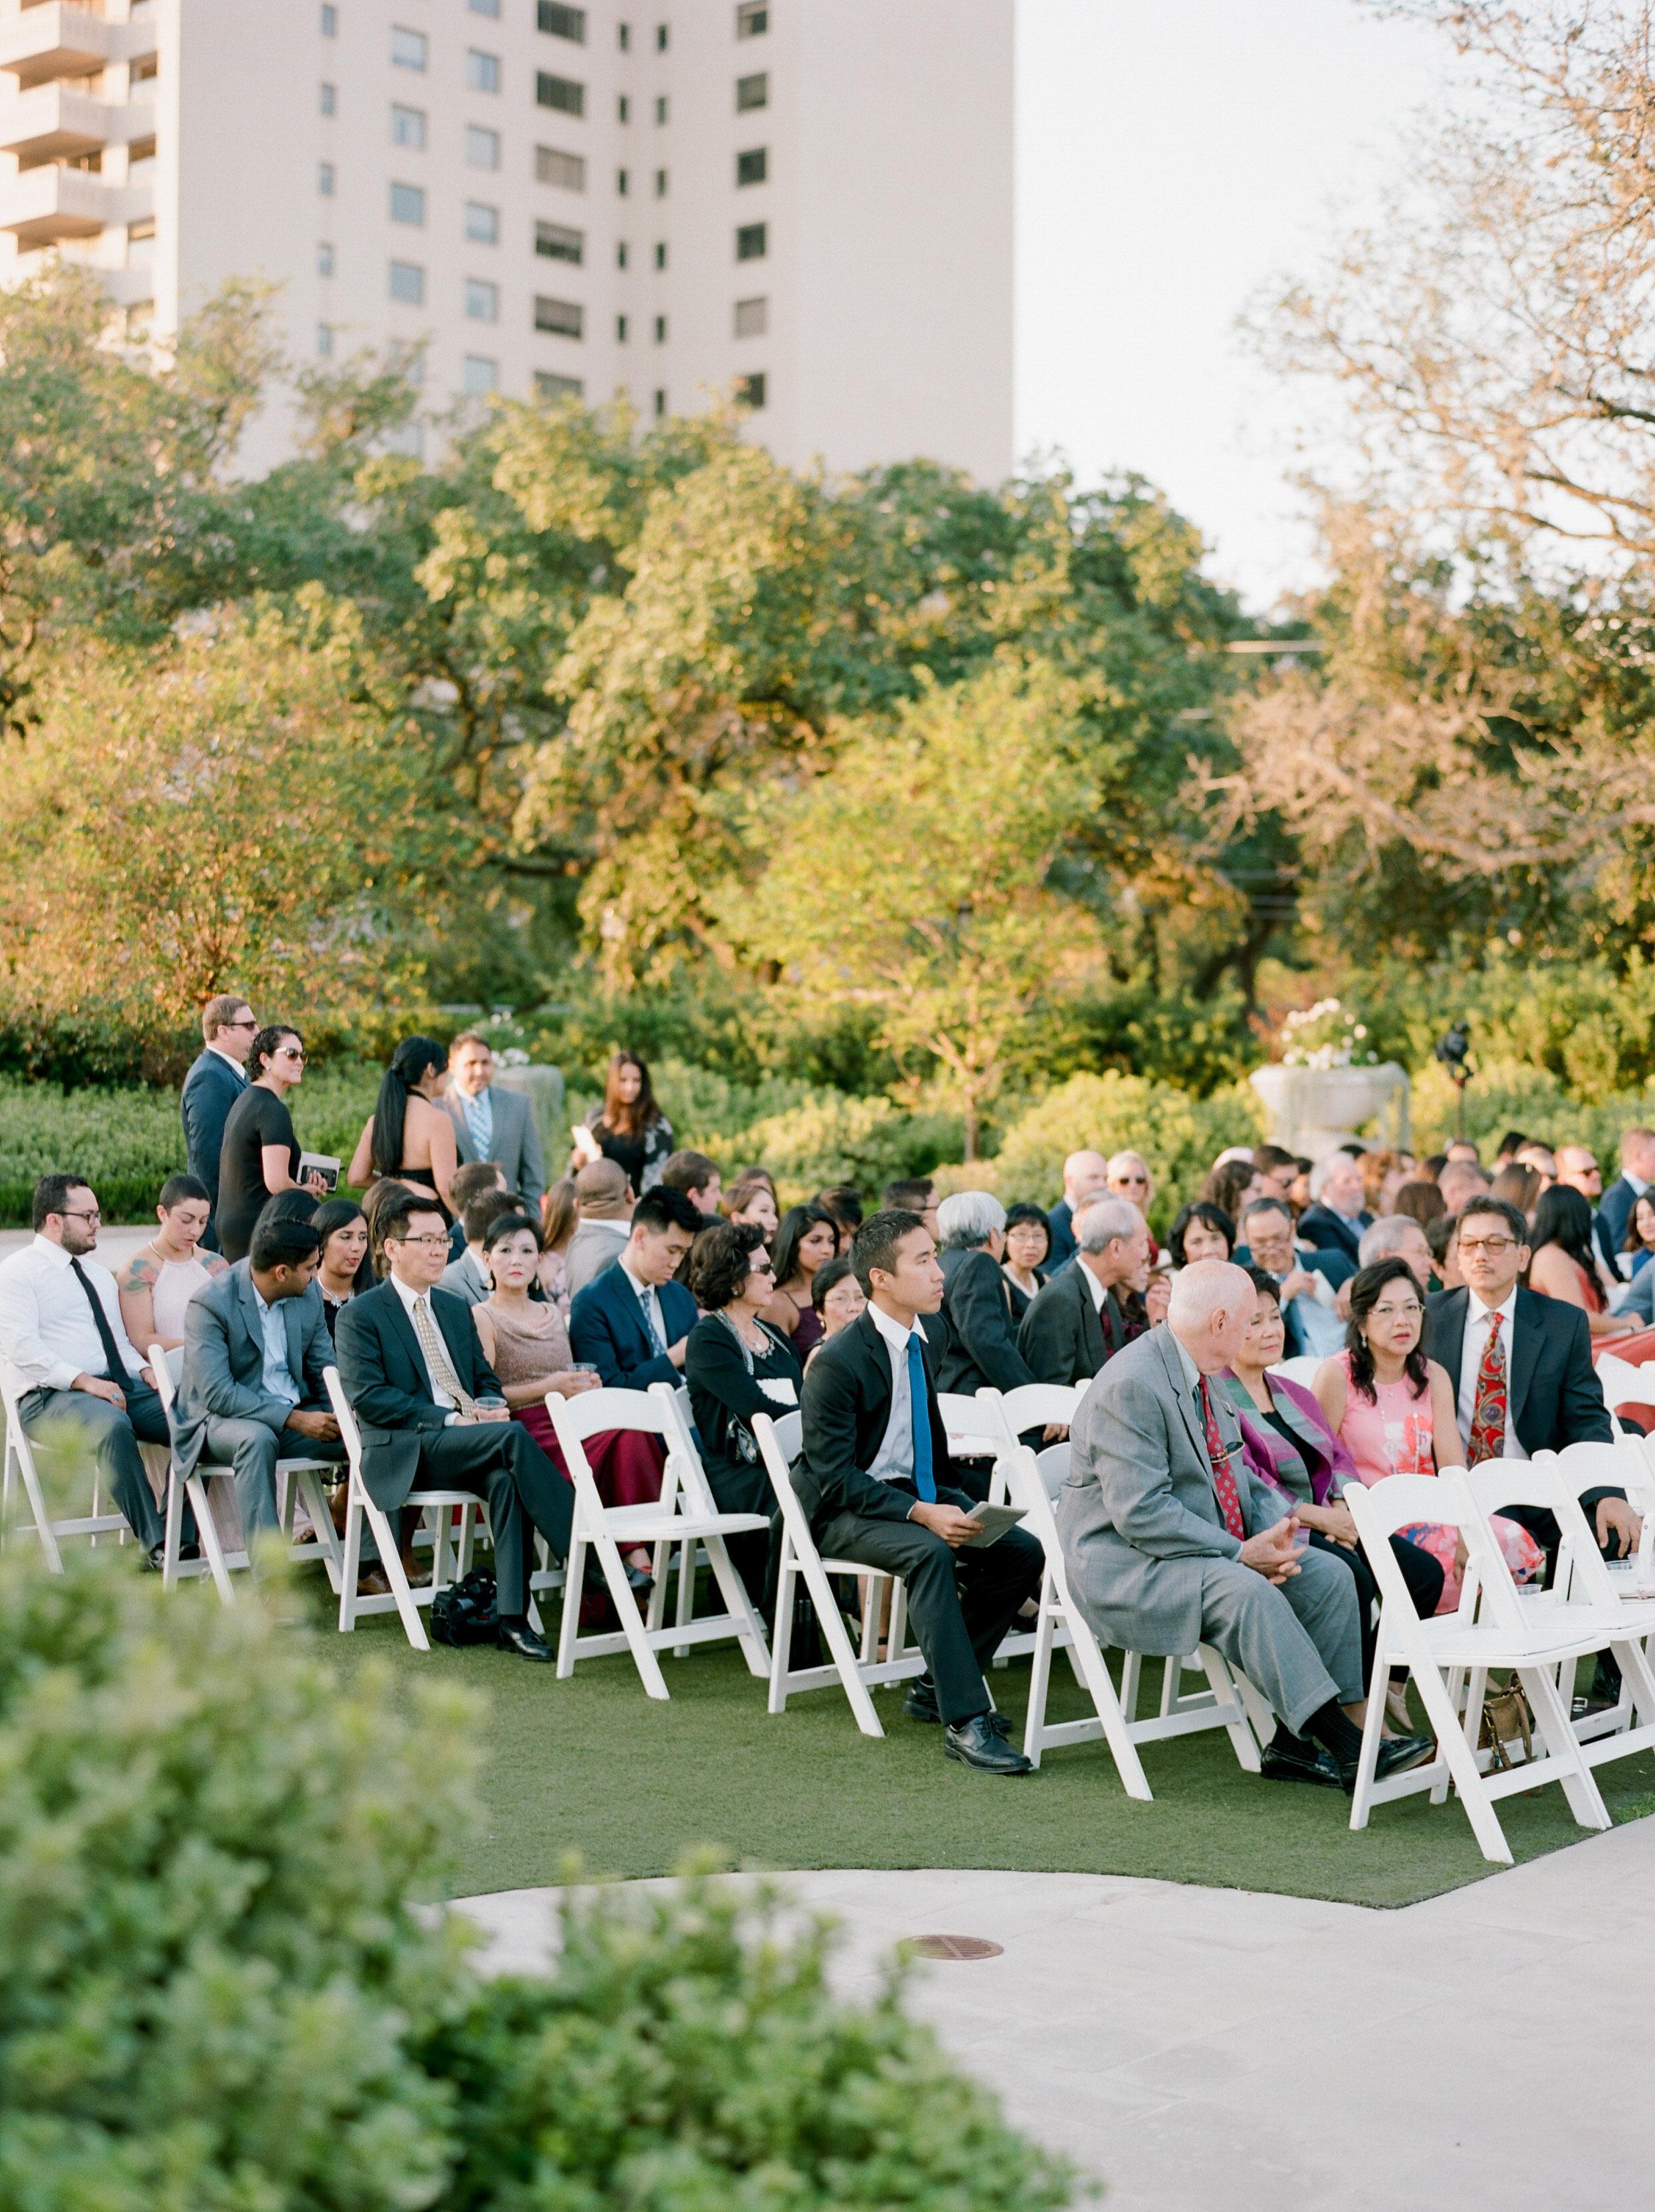 Martha-Stewart-Wedding-Dana-Fernandez-Photography-Josh-Texas-Film-Houston-Wedding-Fine-Art-Photographer-McGovern-Centennial-Gardens-Top-Best-126.jpg